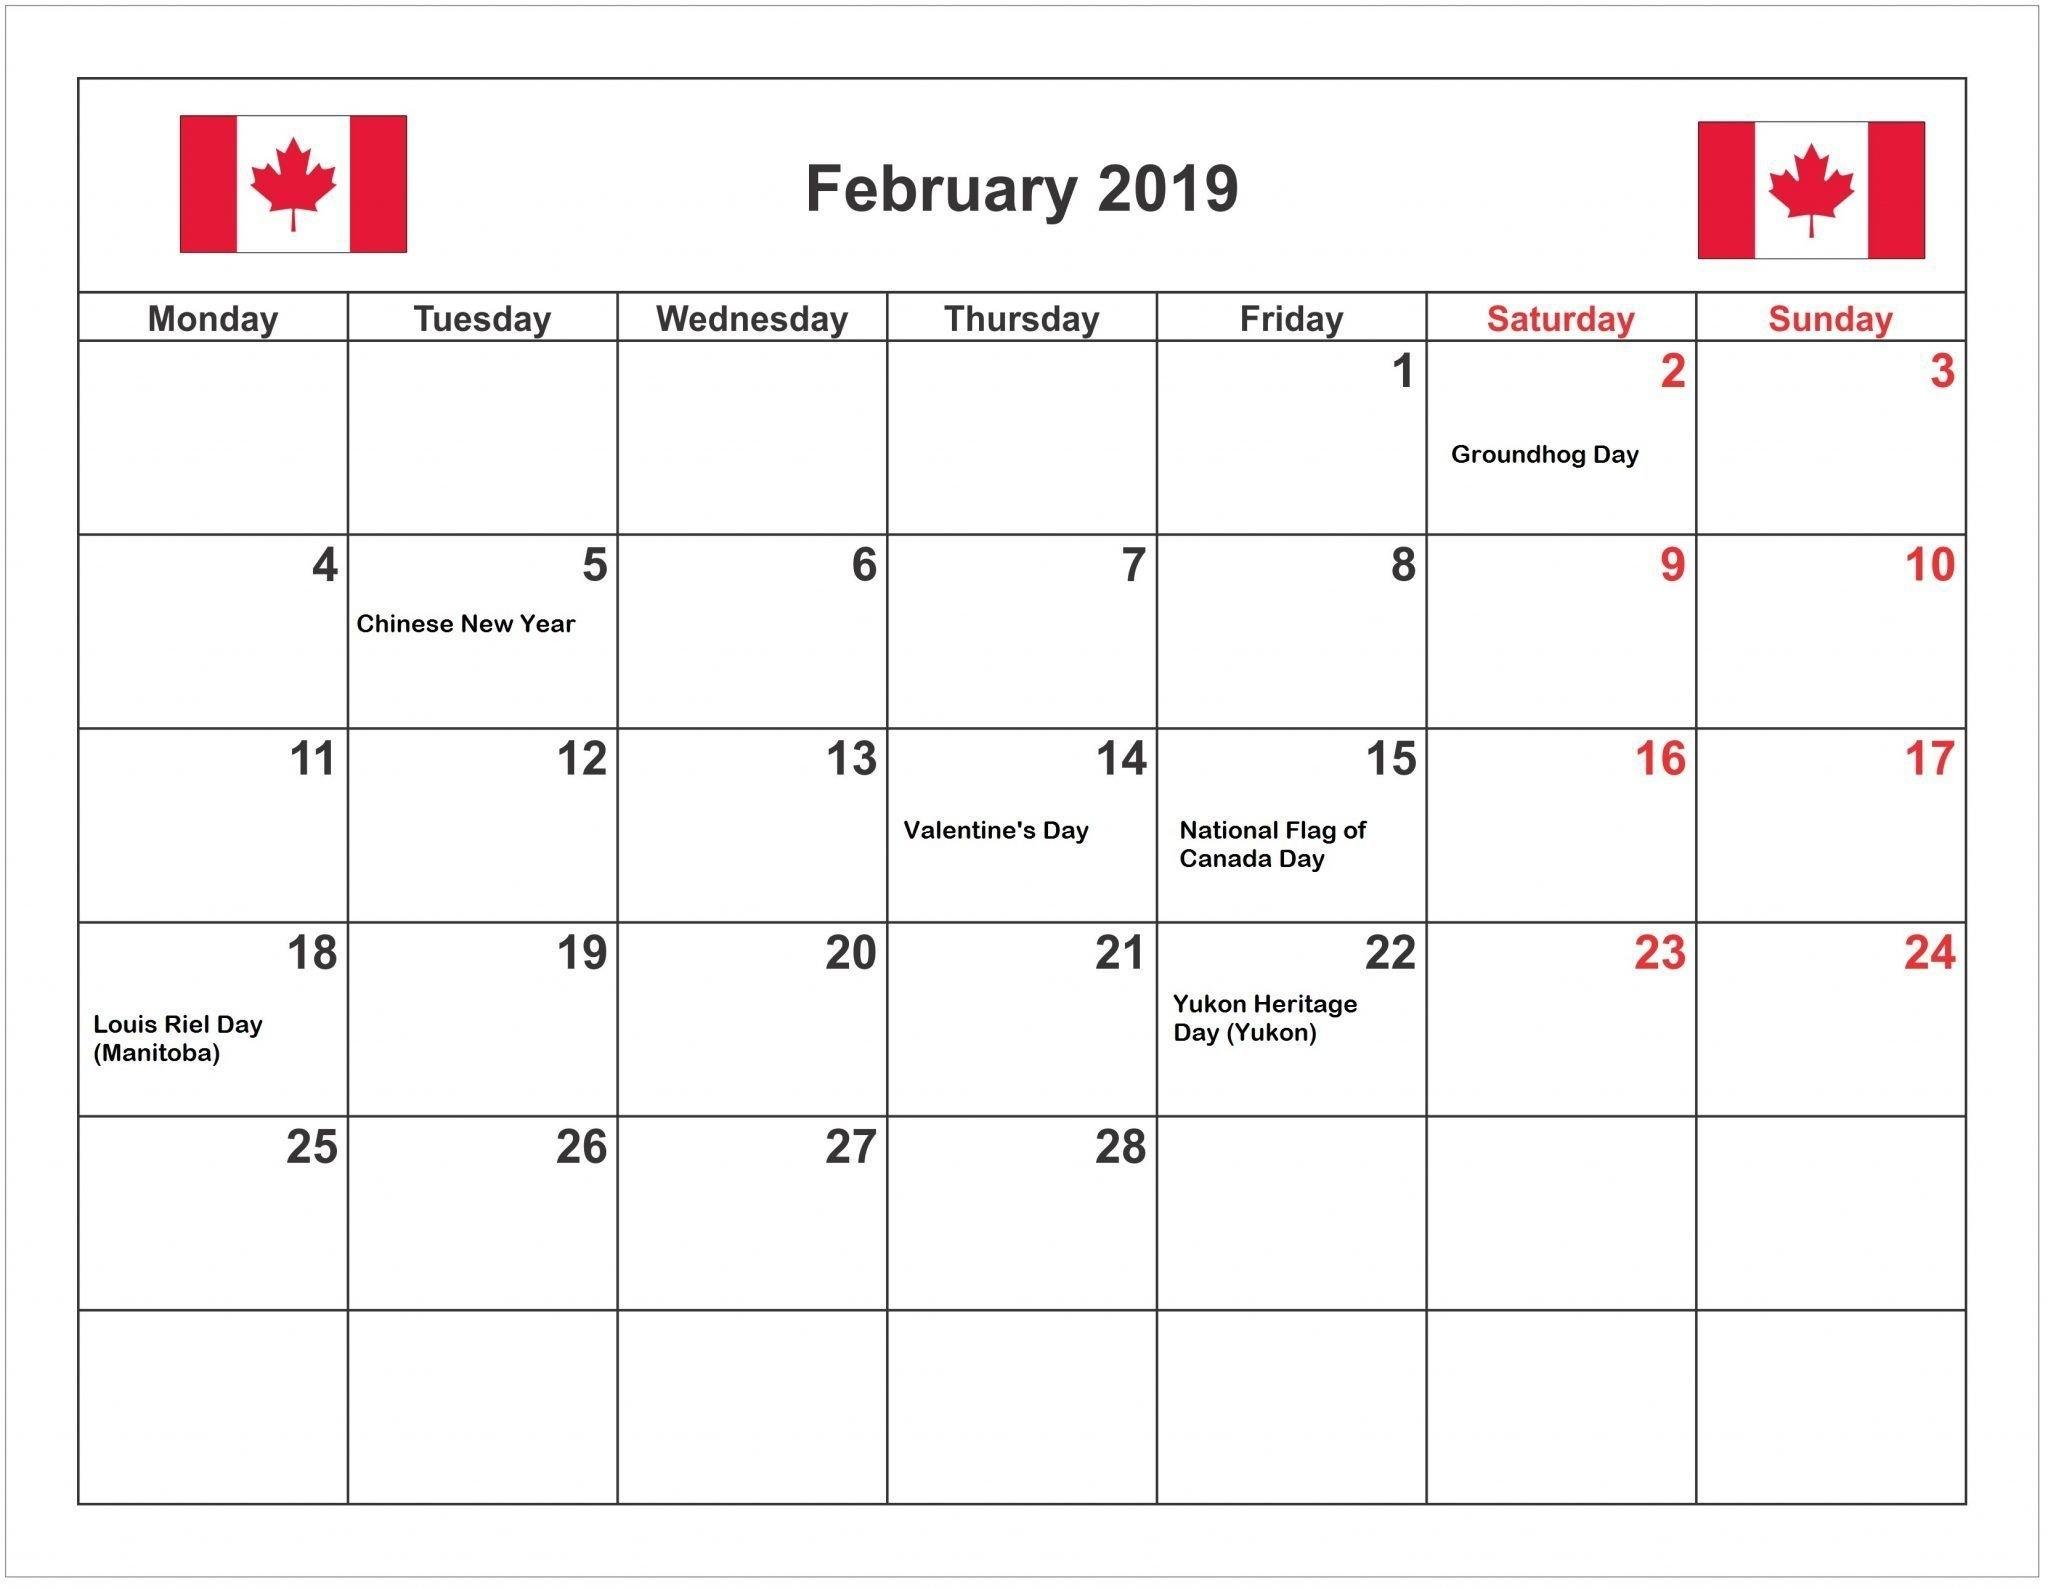 February 2019 Calendar Canada With Holidays | February 2019 Calendar Calendar Of 2019 Canada